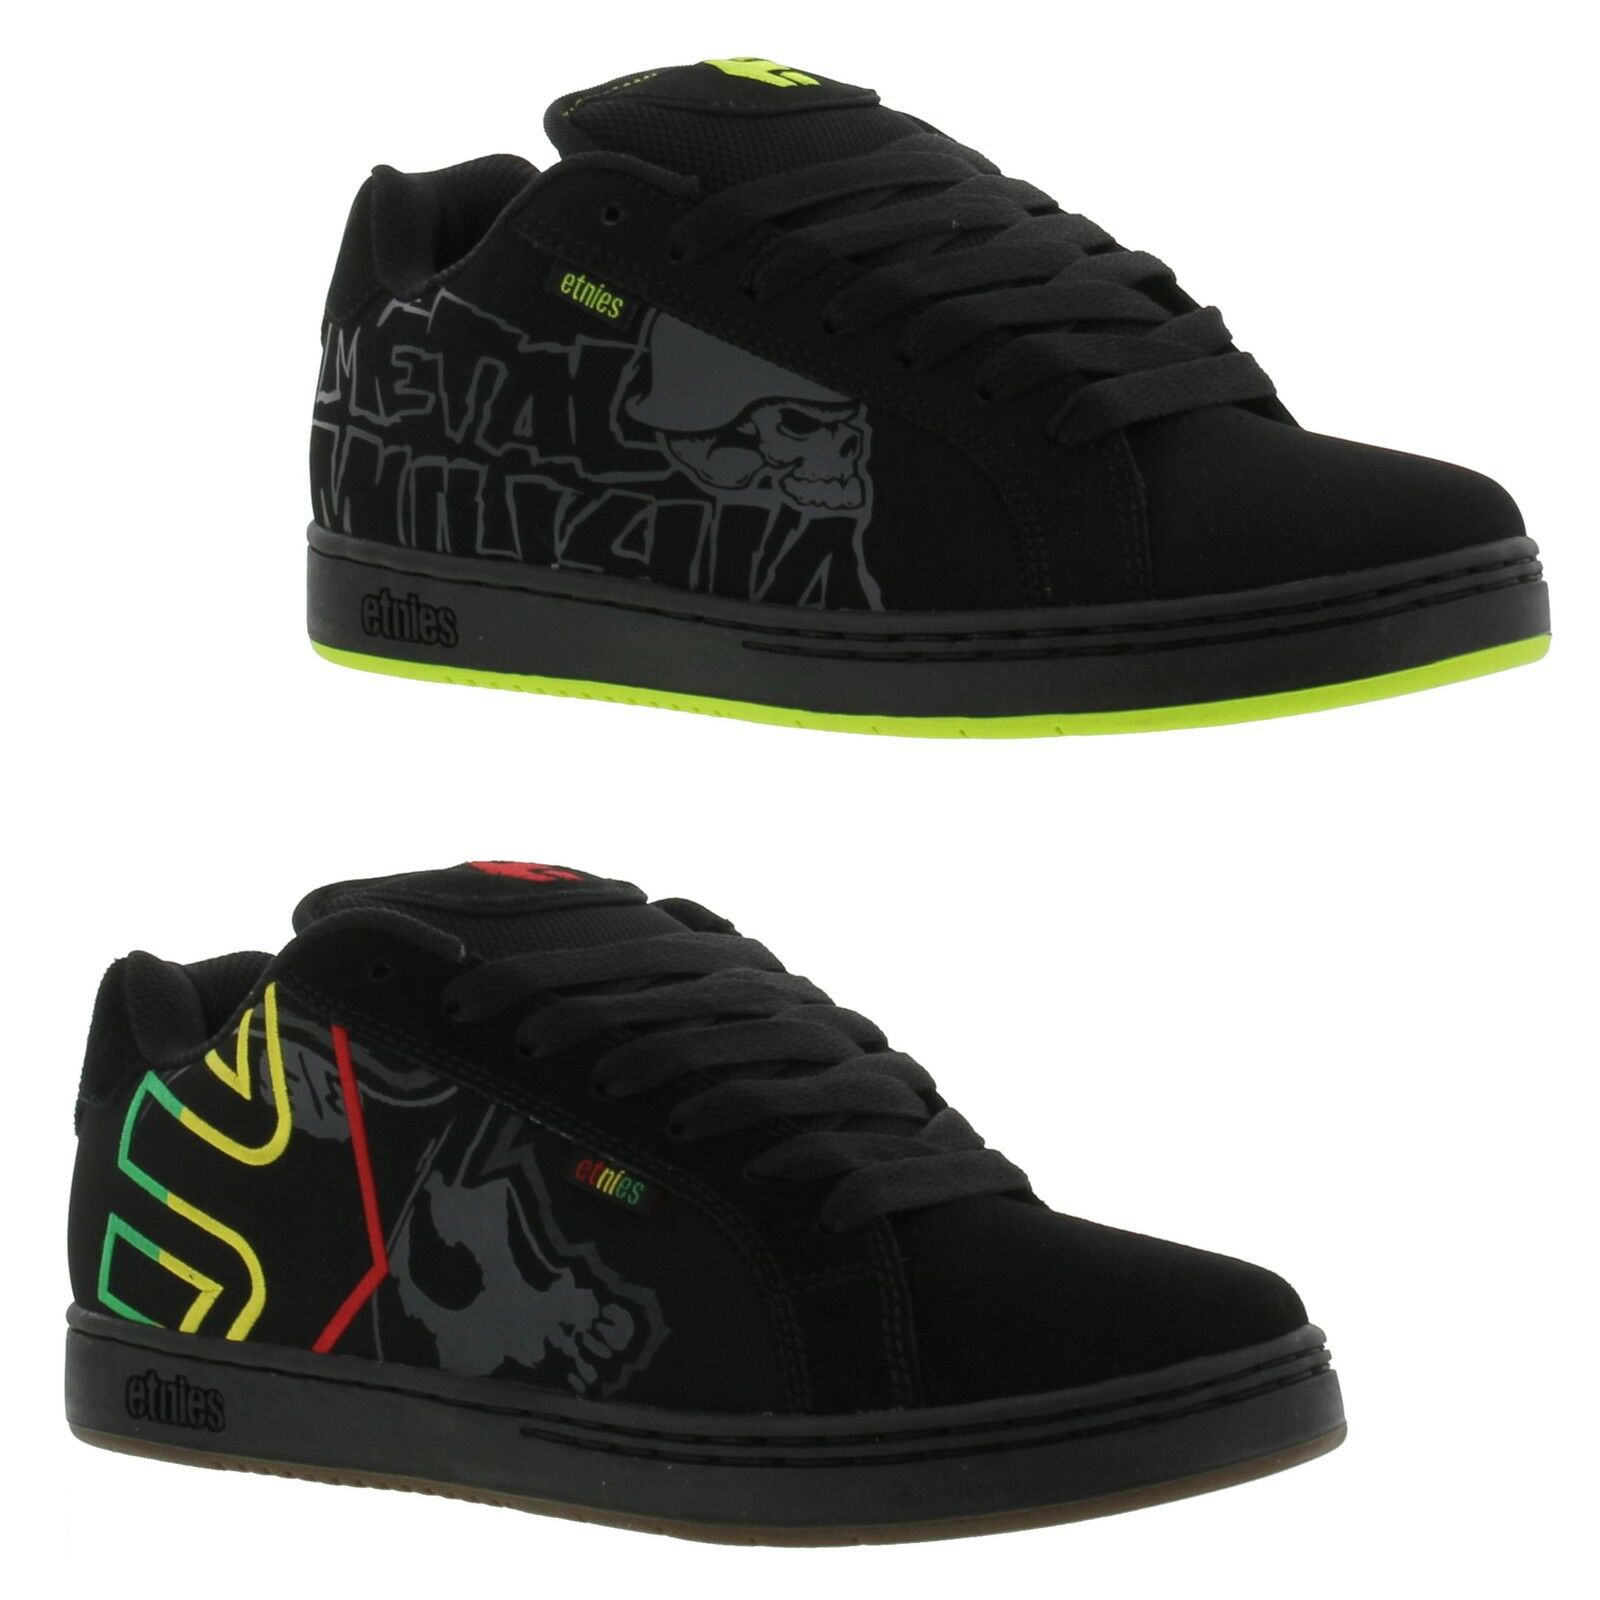 Etnies Metal Mulisha Fader Mens Skate Shoes Trainers Size